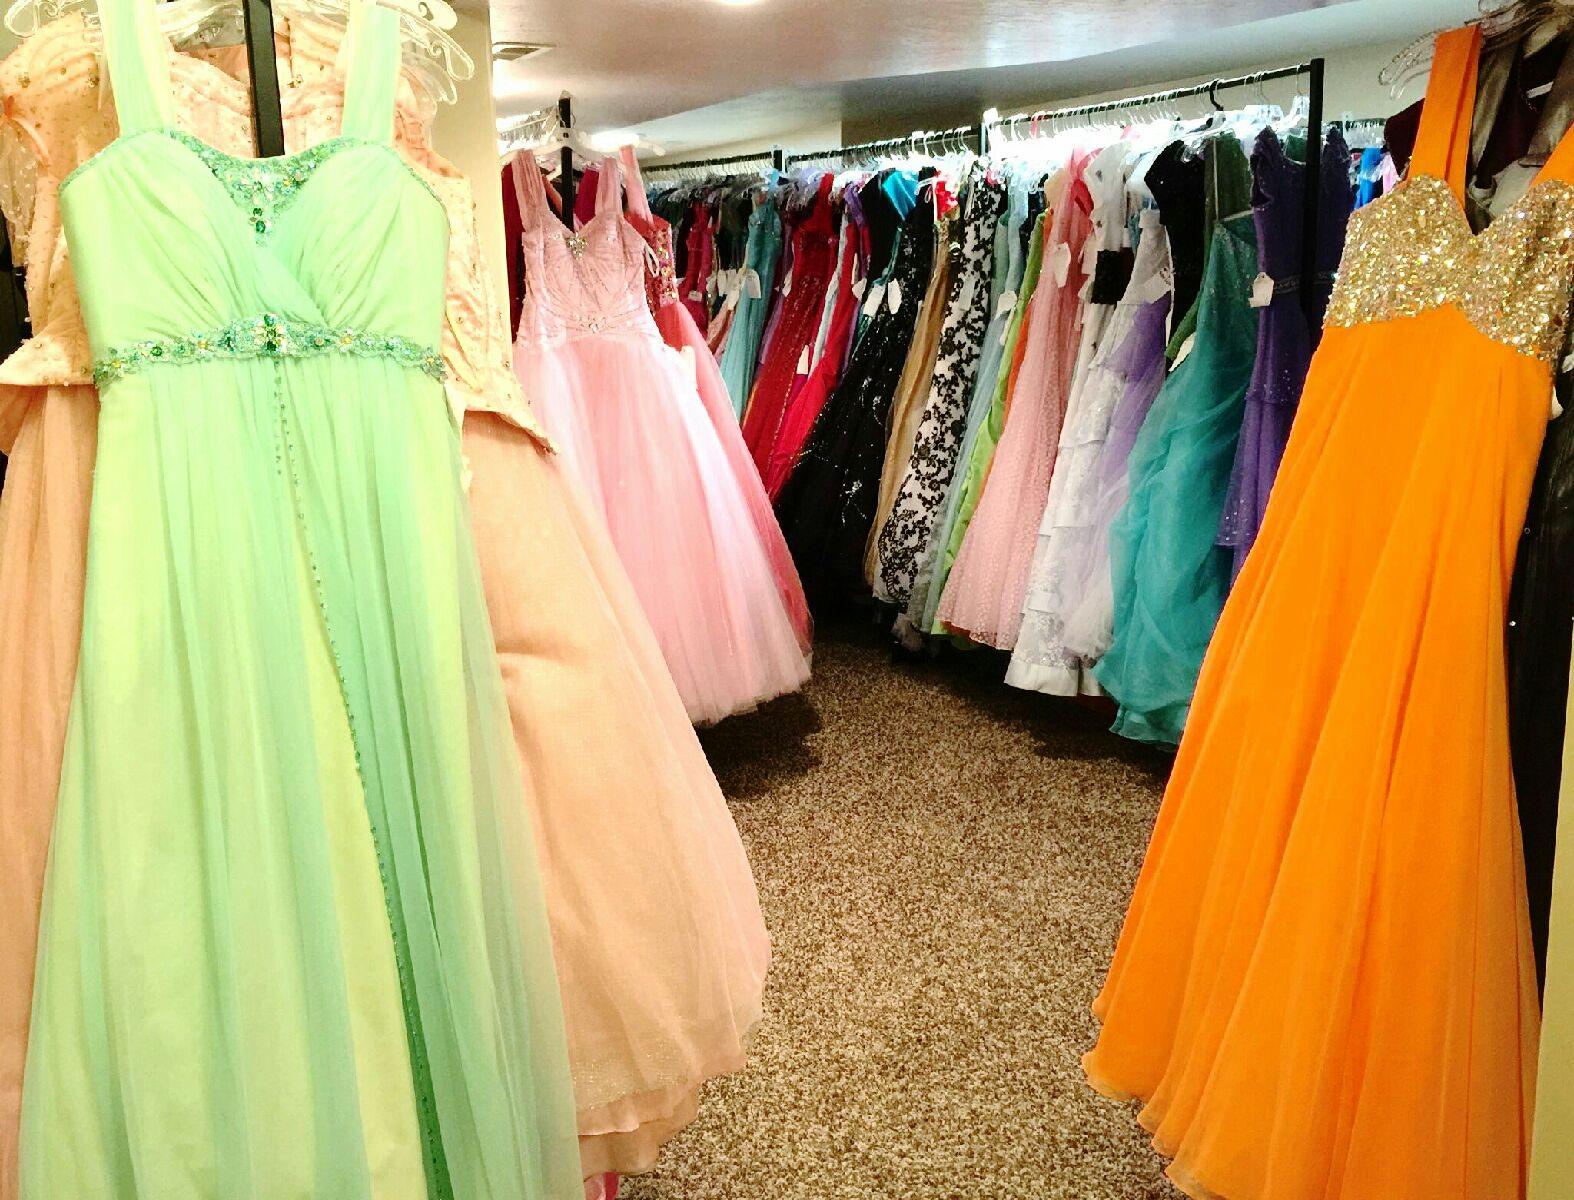 The dress garden - Dresses In Shop 4 Dresses In Shop 3